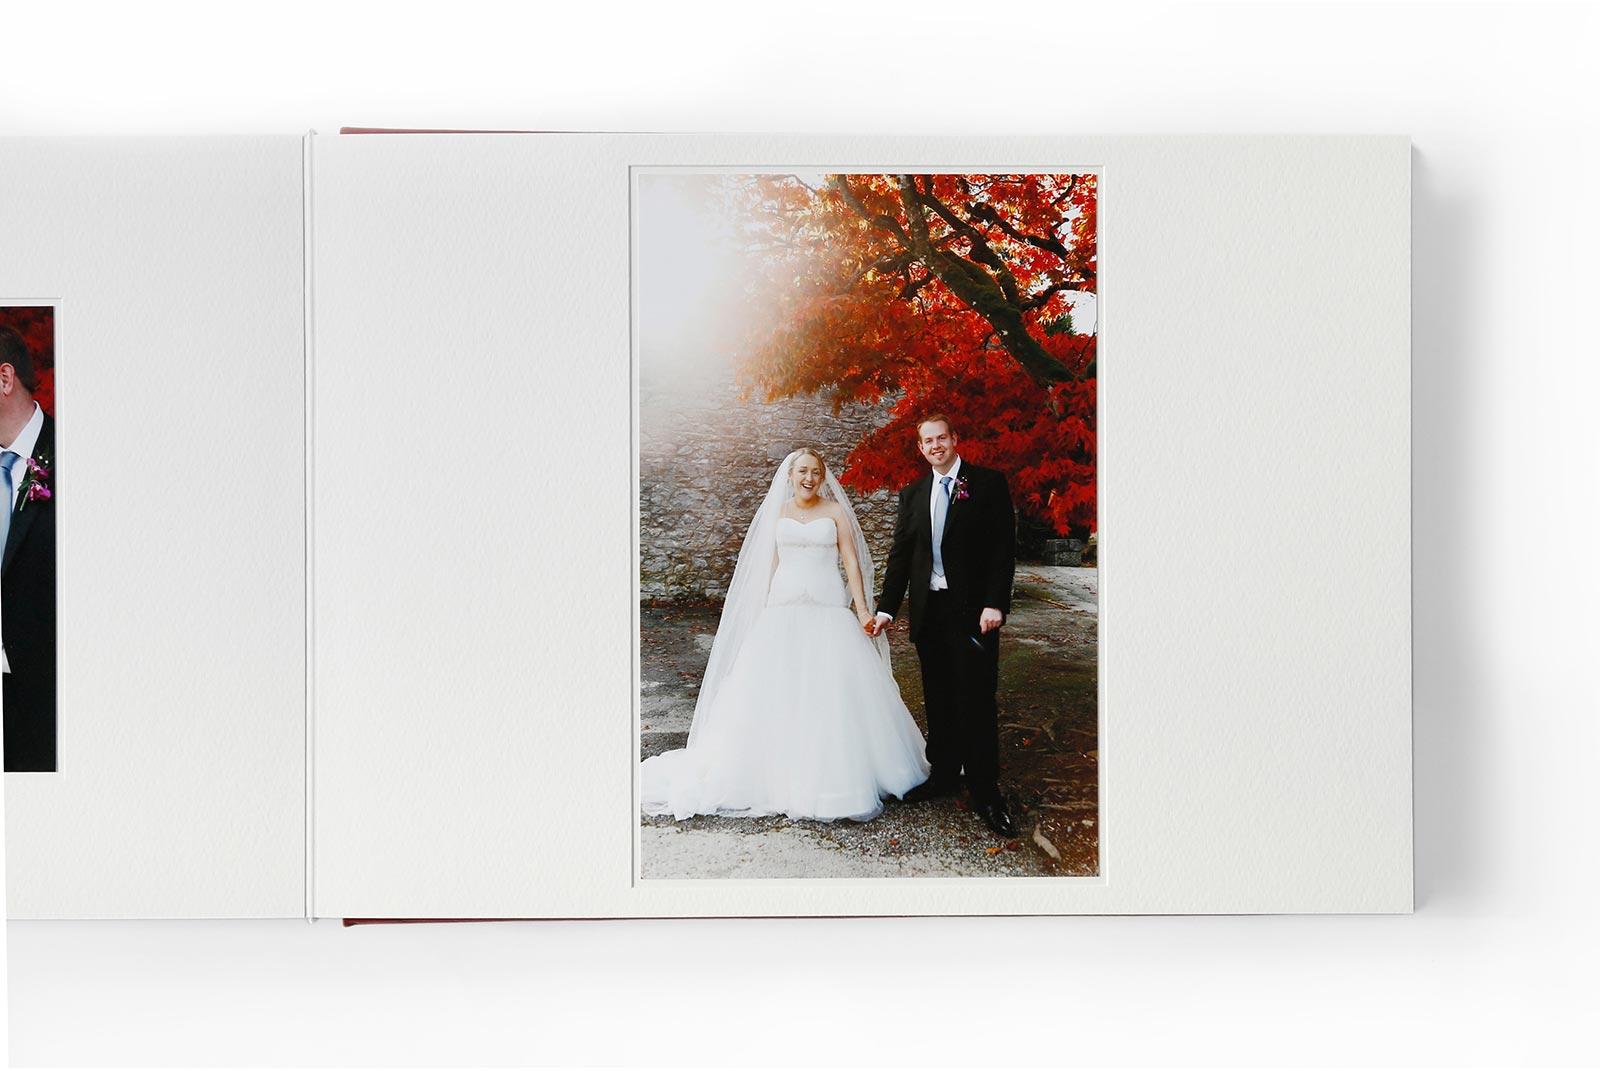 page mount in Queensberry Duo wedding album